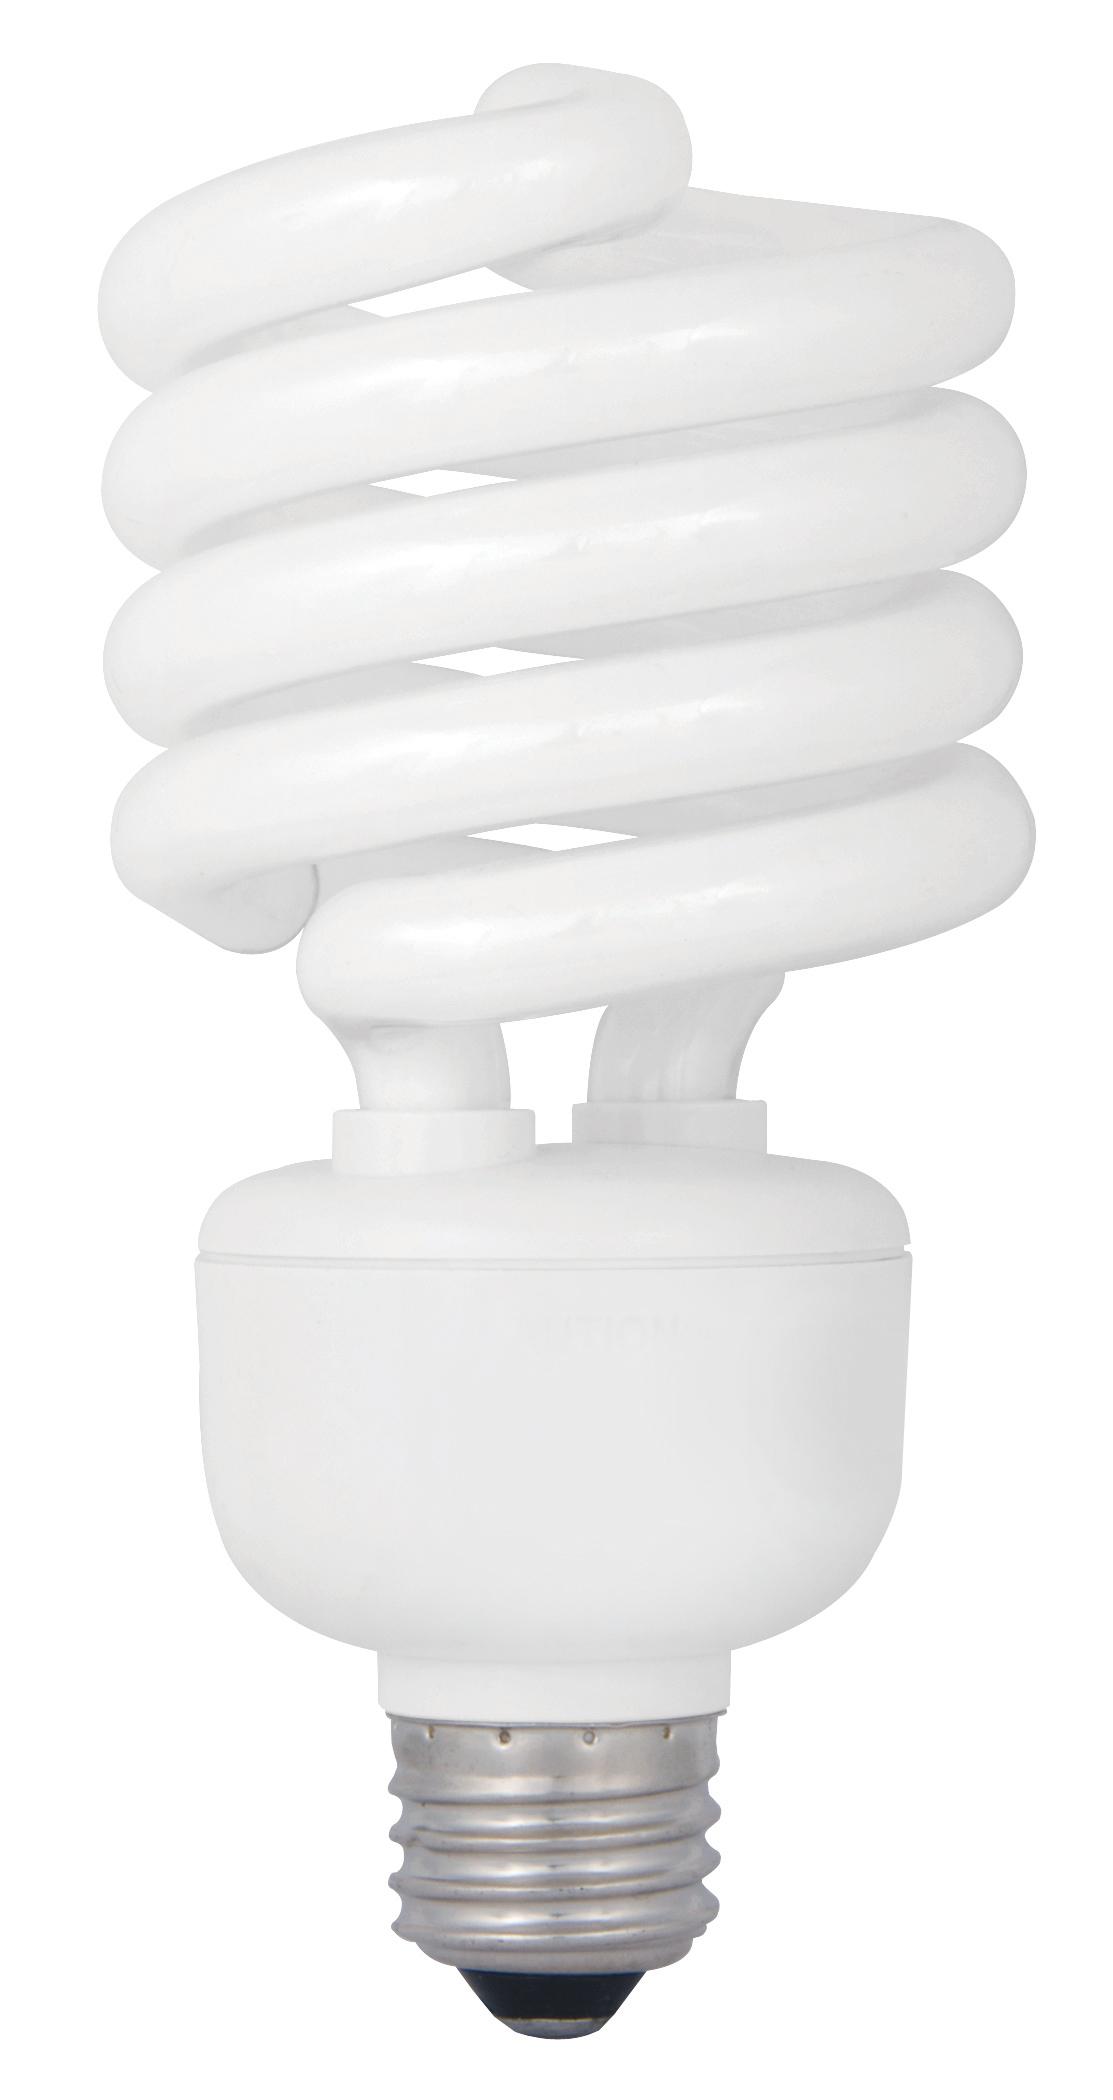 Energy Efficient Light Bulbs PNG - 163000